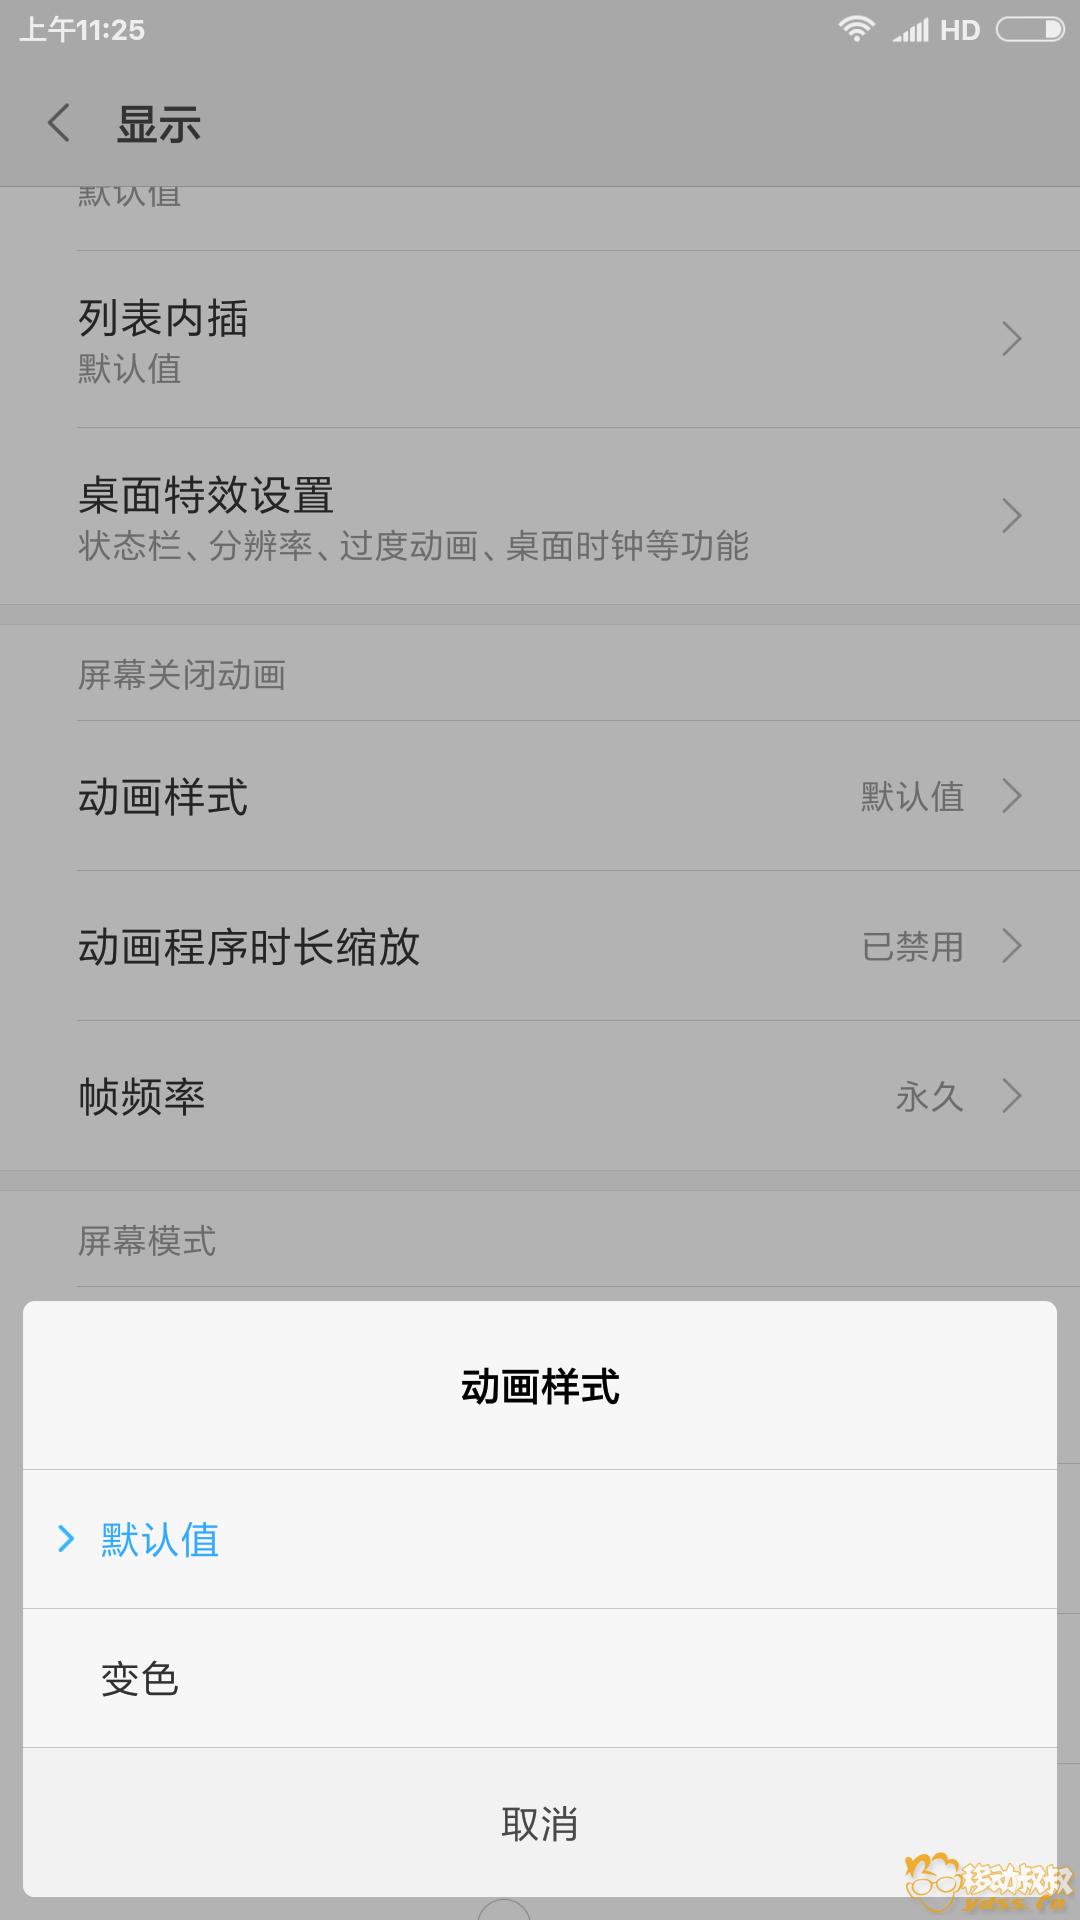 Screenshot_2018-05-04-11-25-15-584_com.android.settings.png